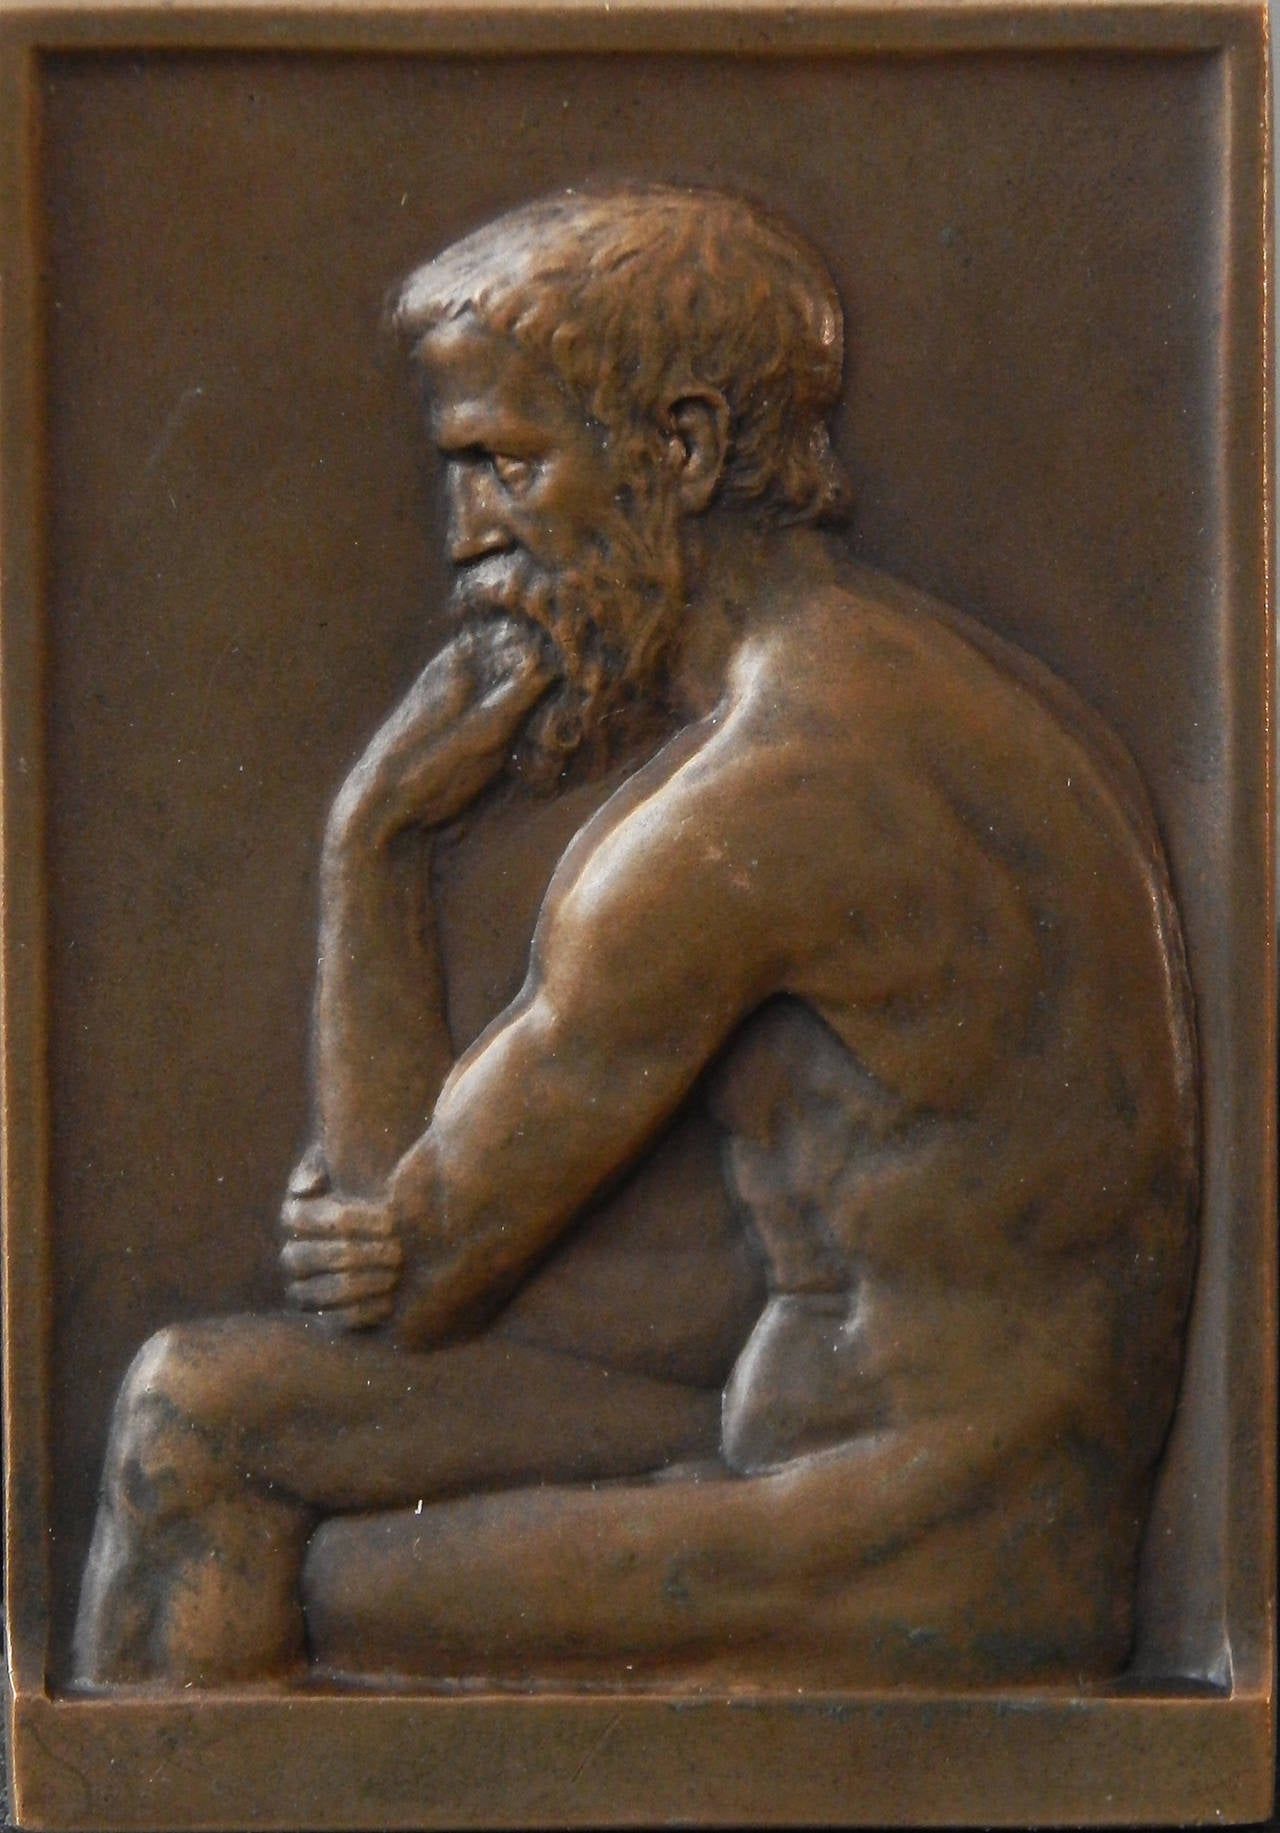 German Rare Bronze Paperweight Celebrating 500th Anniversary of Leipzig Univ, 1909 For Sale